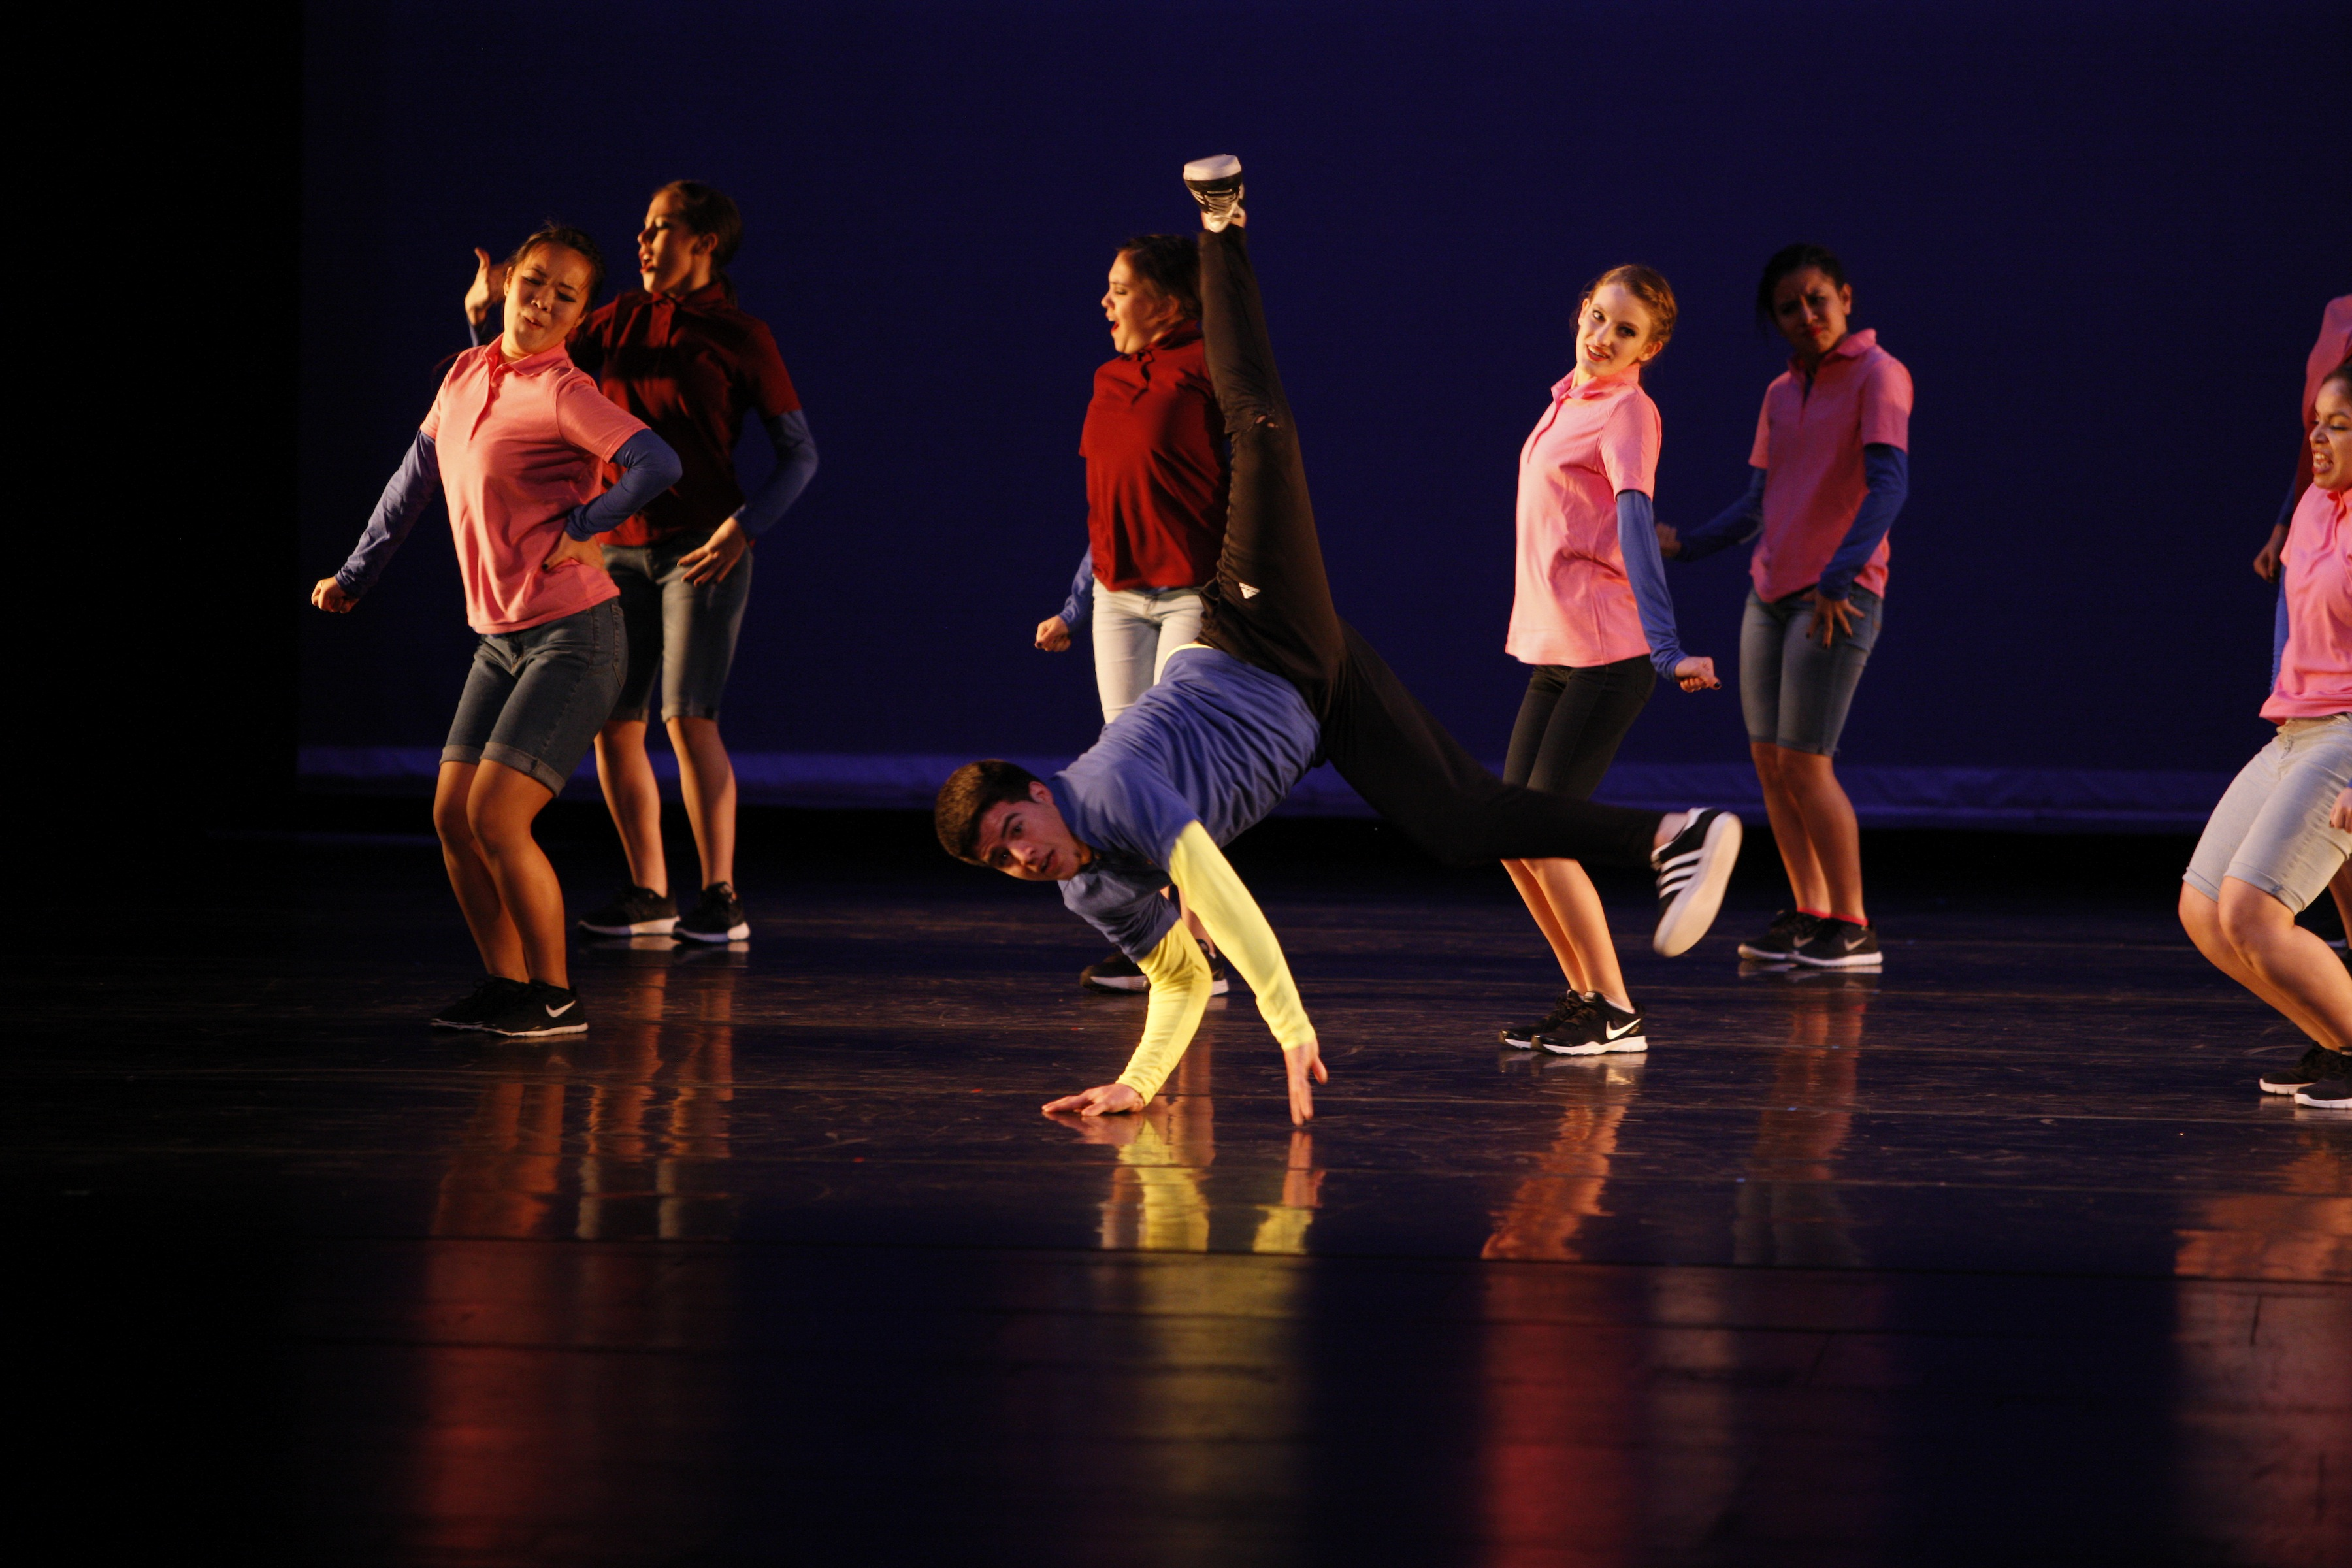 Inertia Dance Company